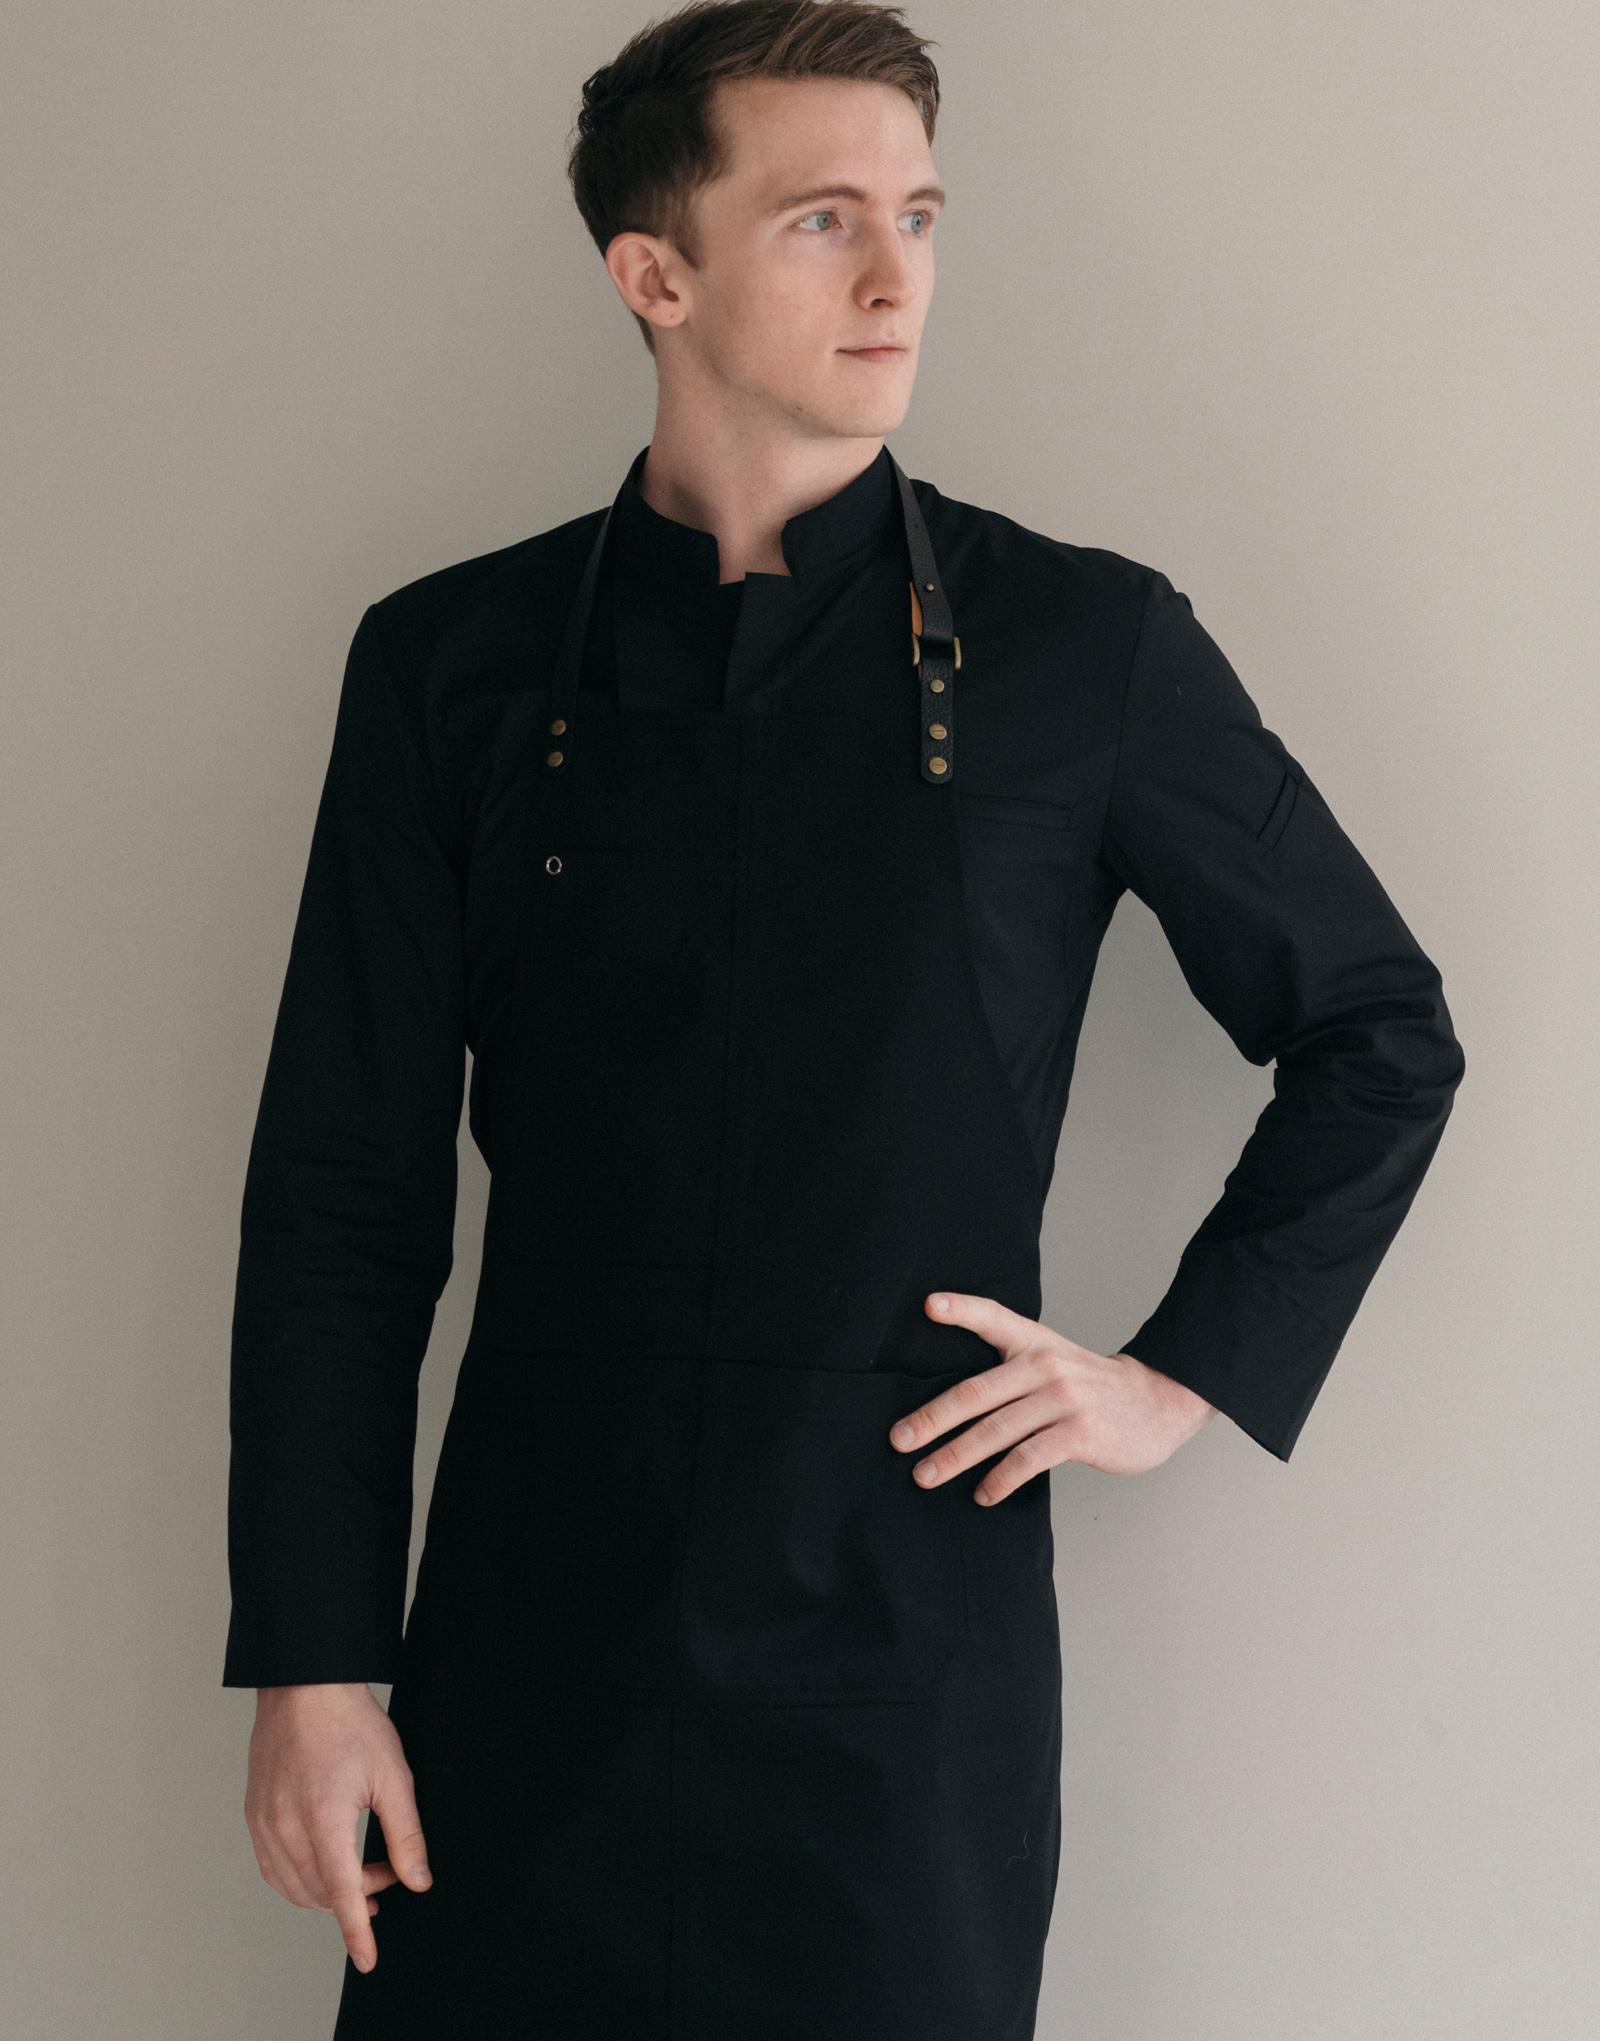 strap change custom Bib apron #AA1976 black